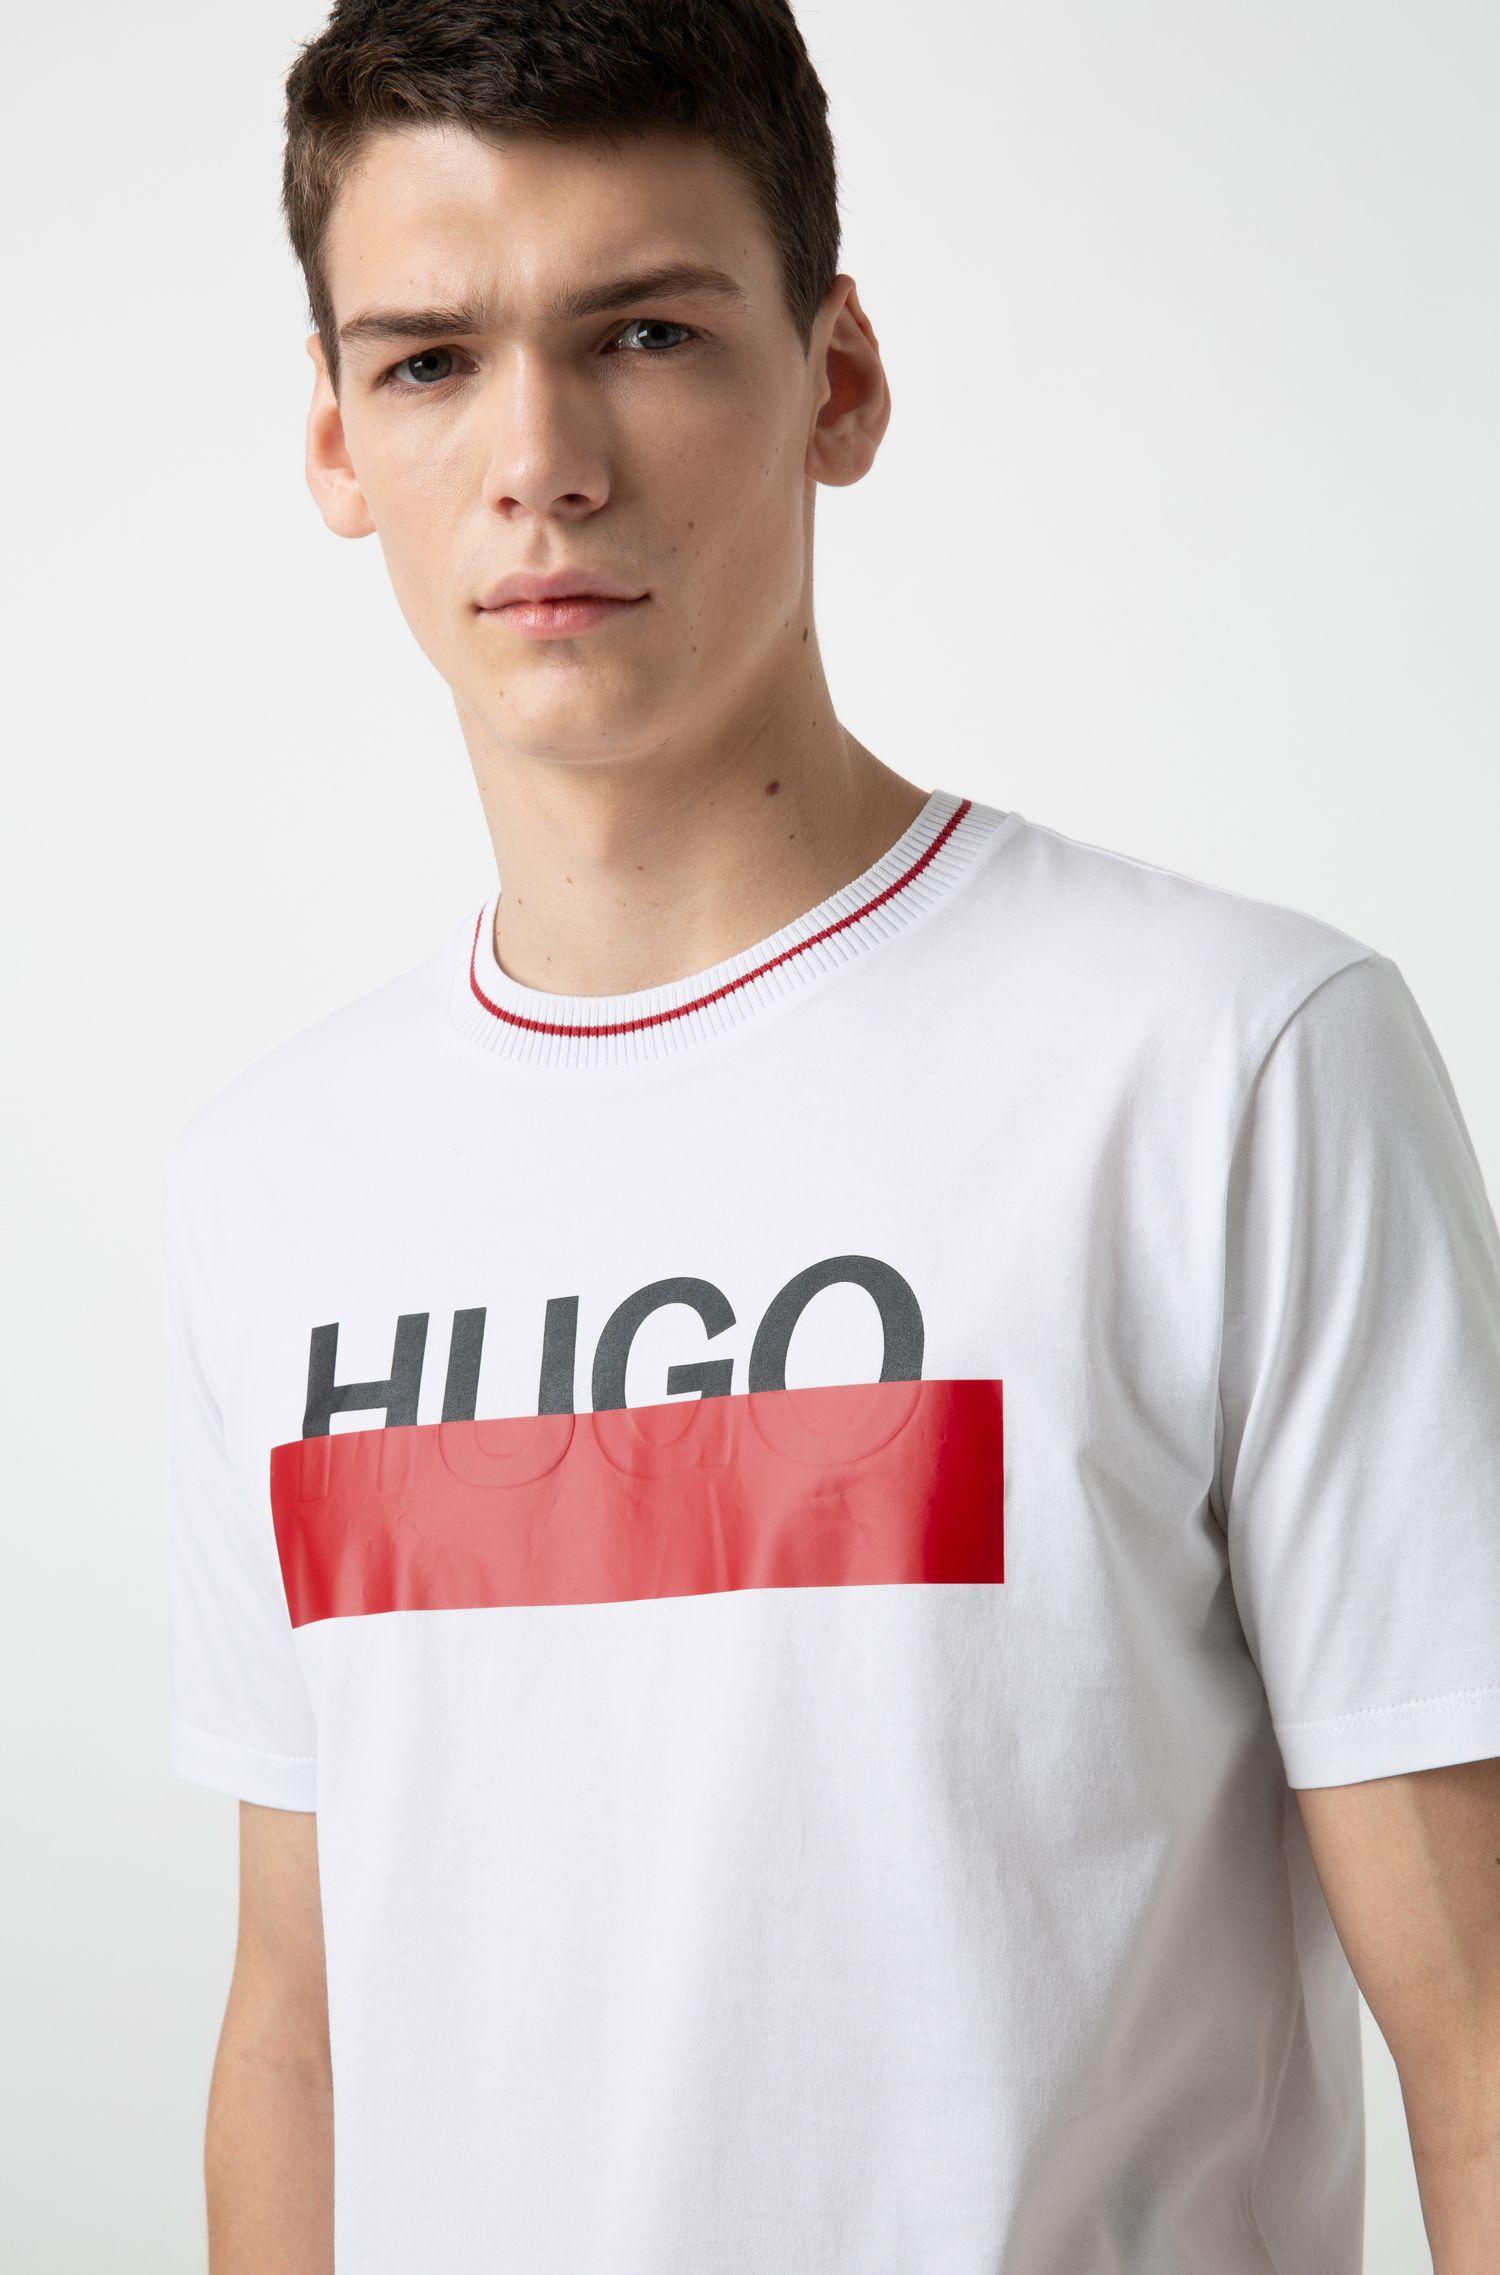 Hugo Boss - T-Shirt aus Baumwolle mit teilweise verdecktem Logo - 2